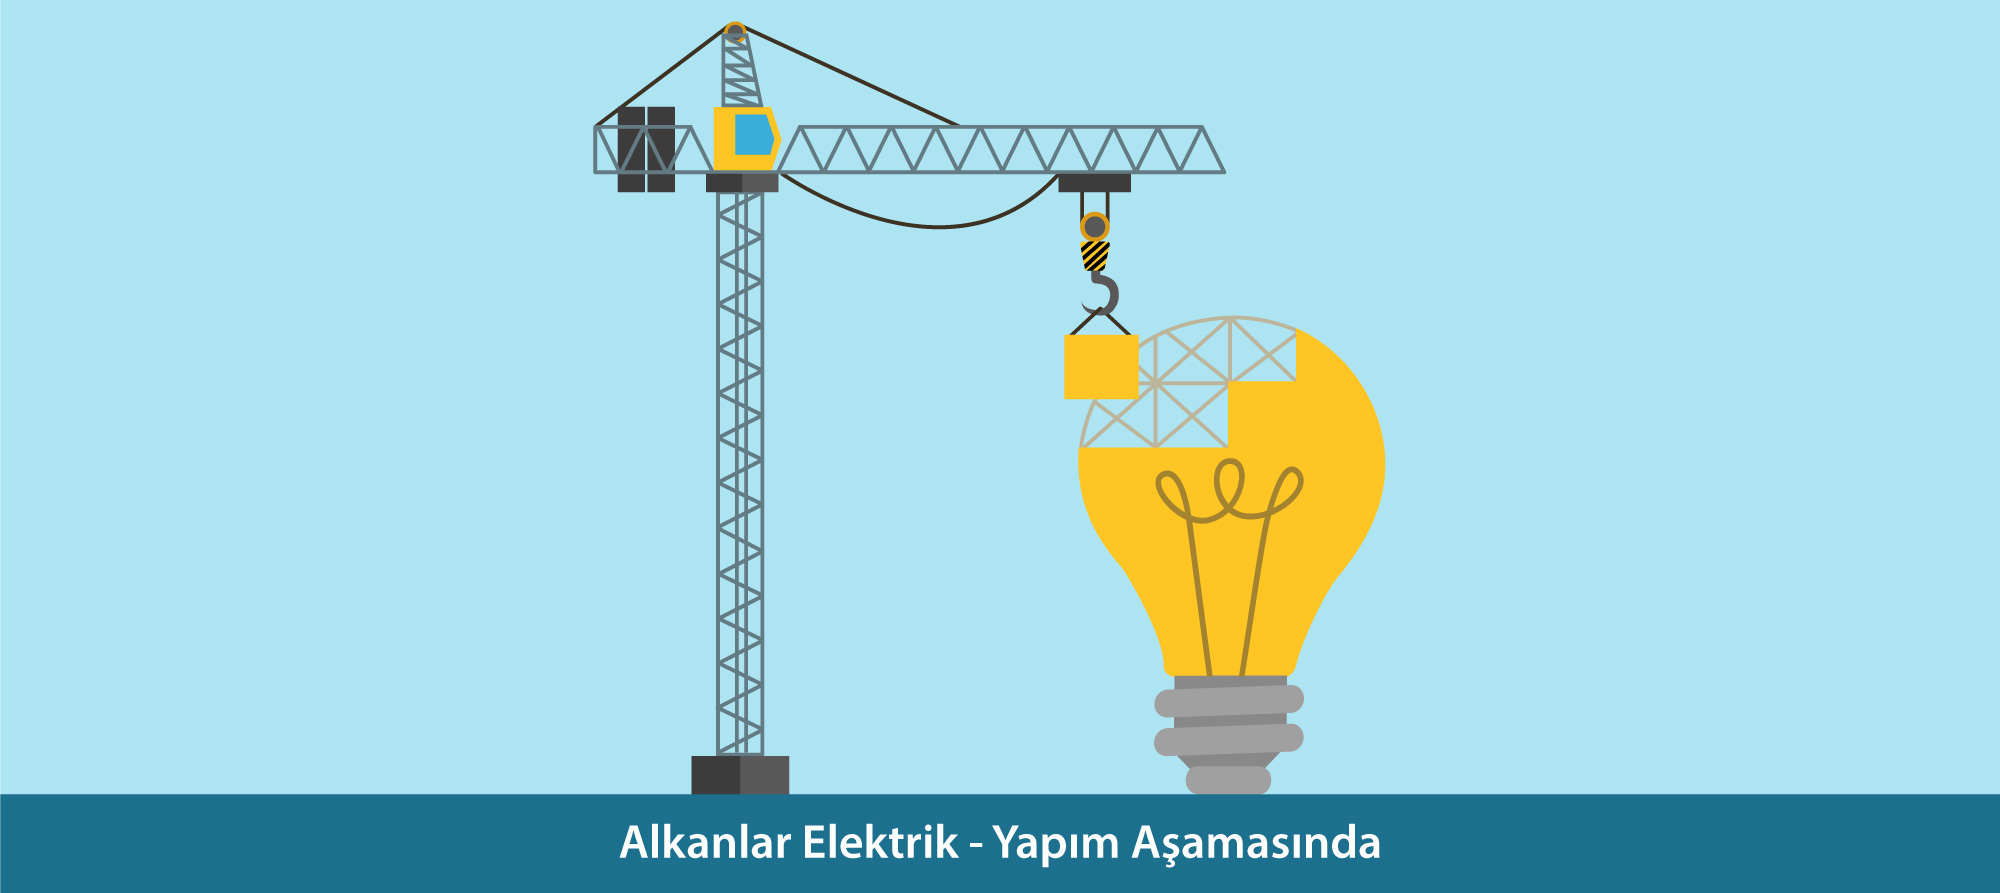 Alkanlar Elektrik